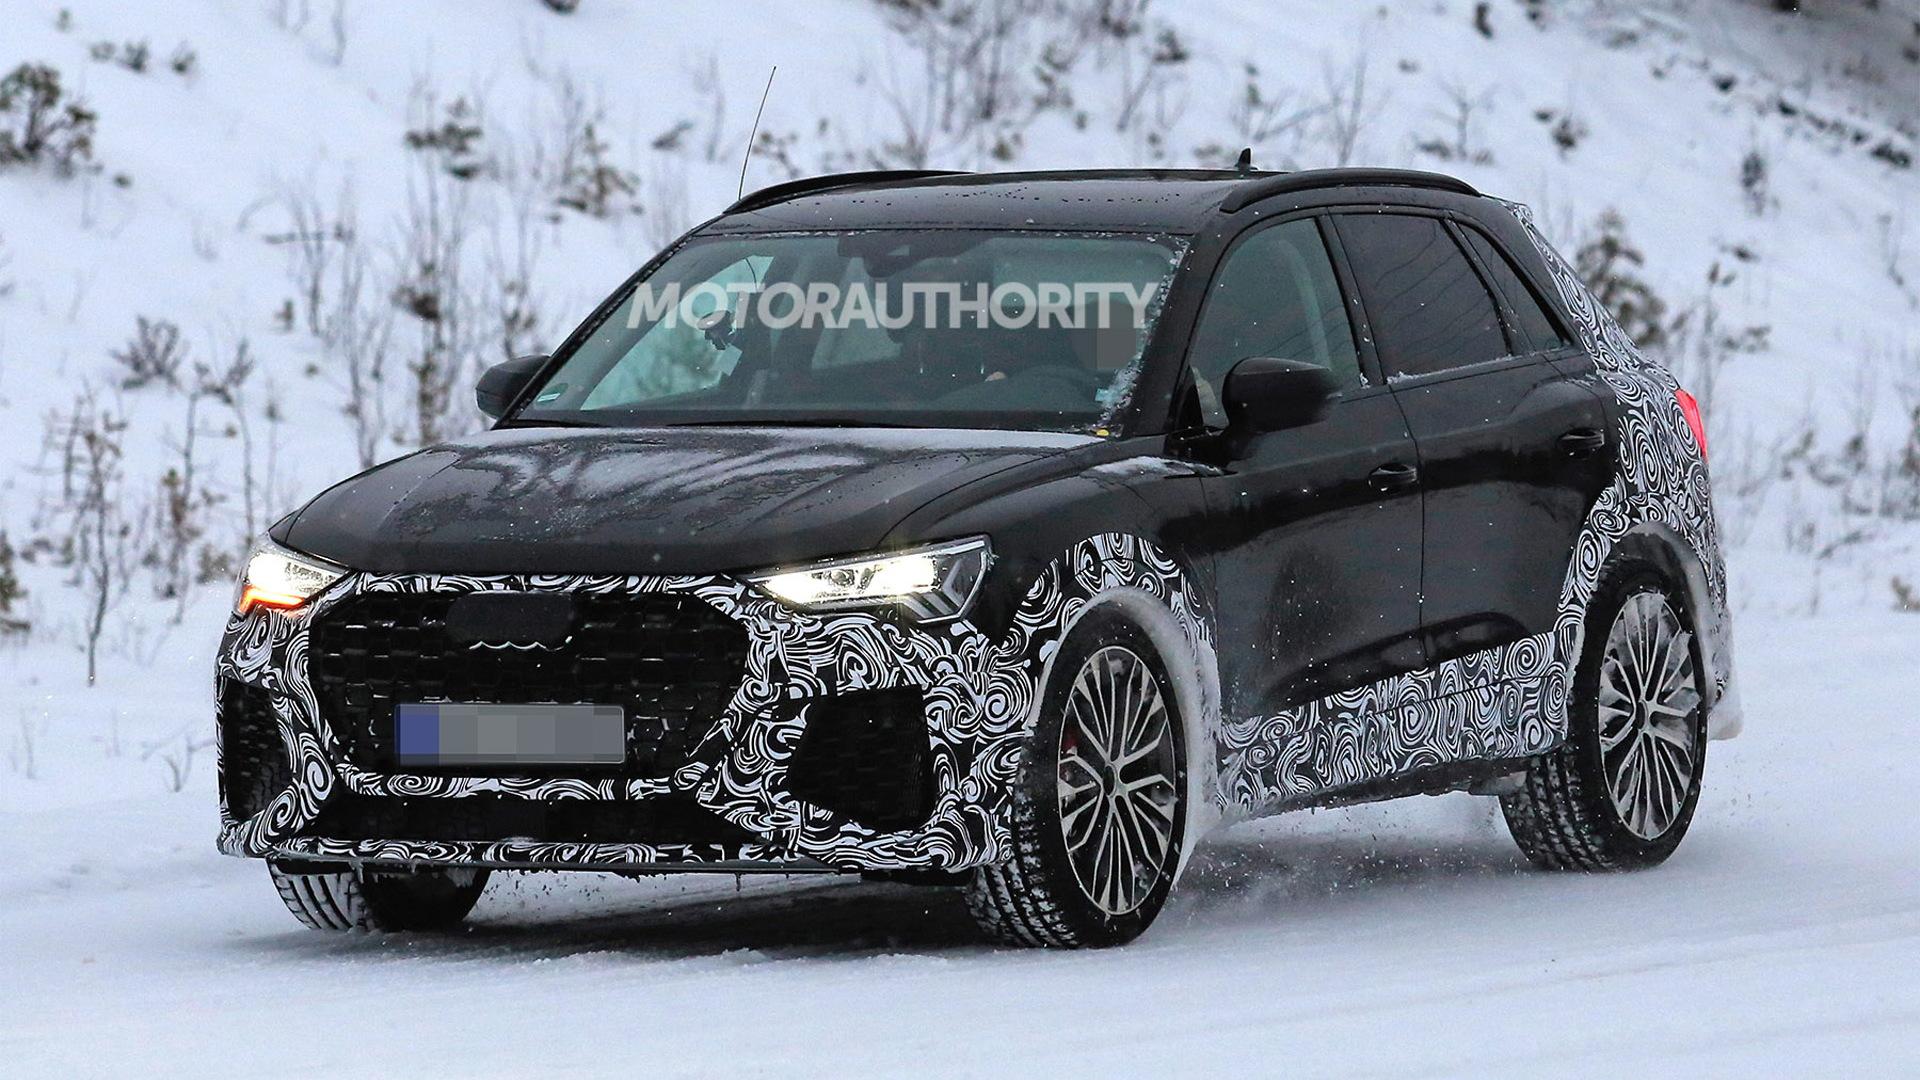 2020 Audi RS Q3 spy shots - Image via S. Baldauf/SB-Medien